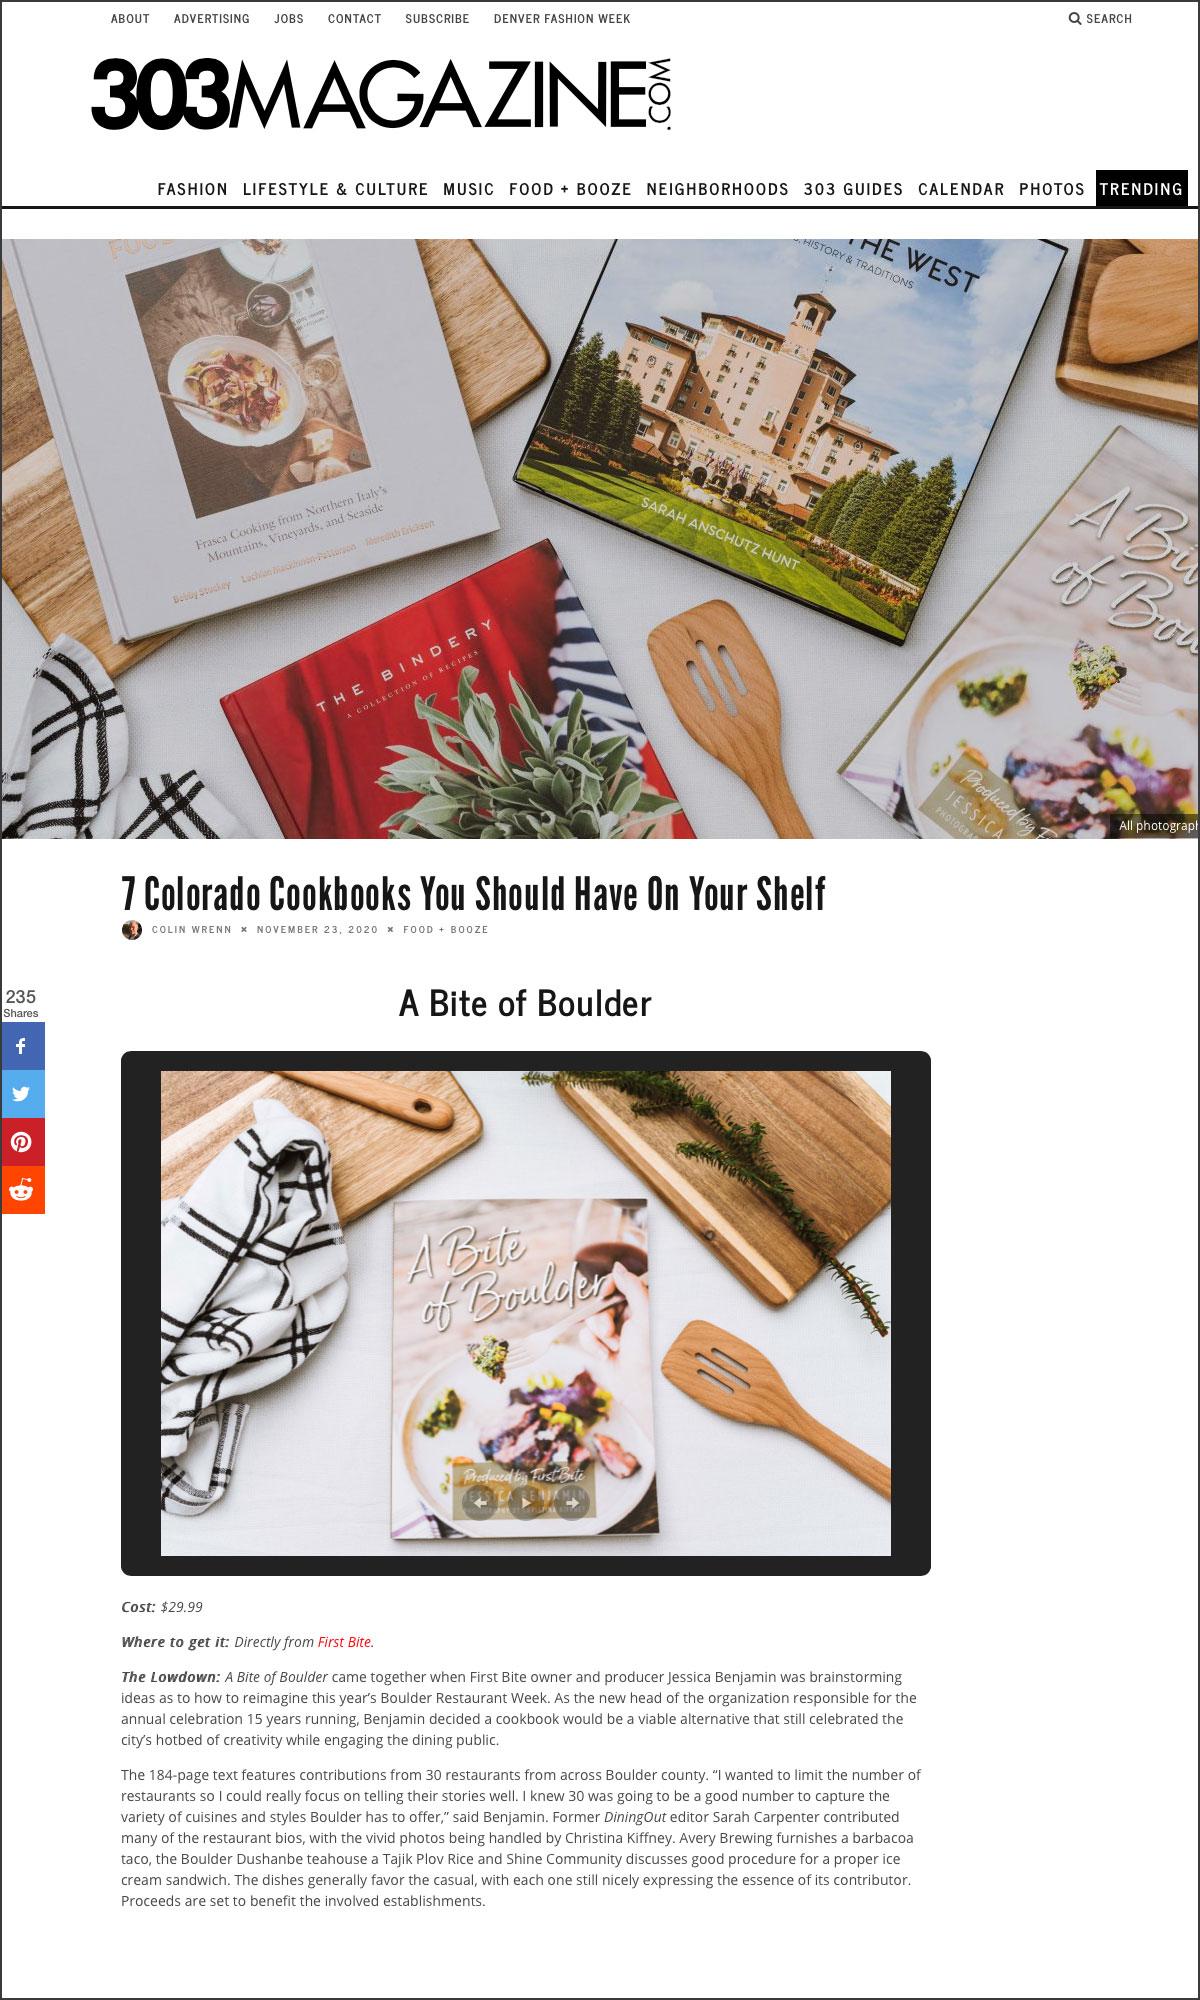 303 Magazine Gift Guide